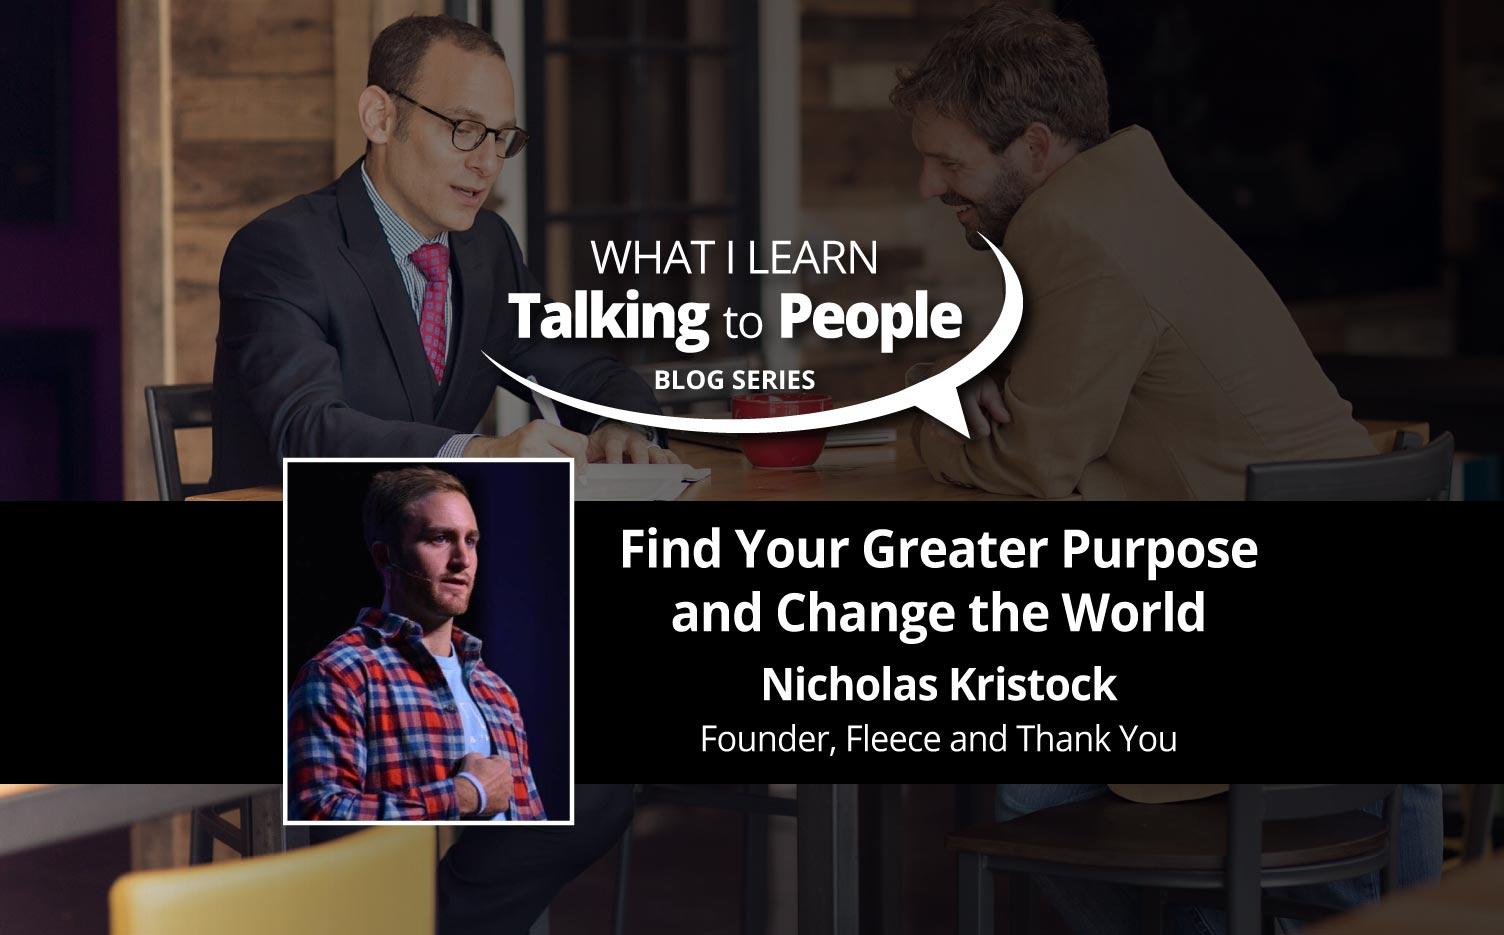 Jon-Dwoskins-What-I-Learn-Talking-to-People-Blog-Featuring-Nicholas-Kristock